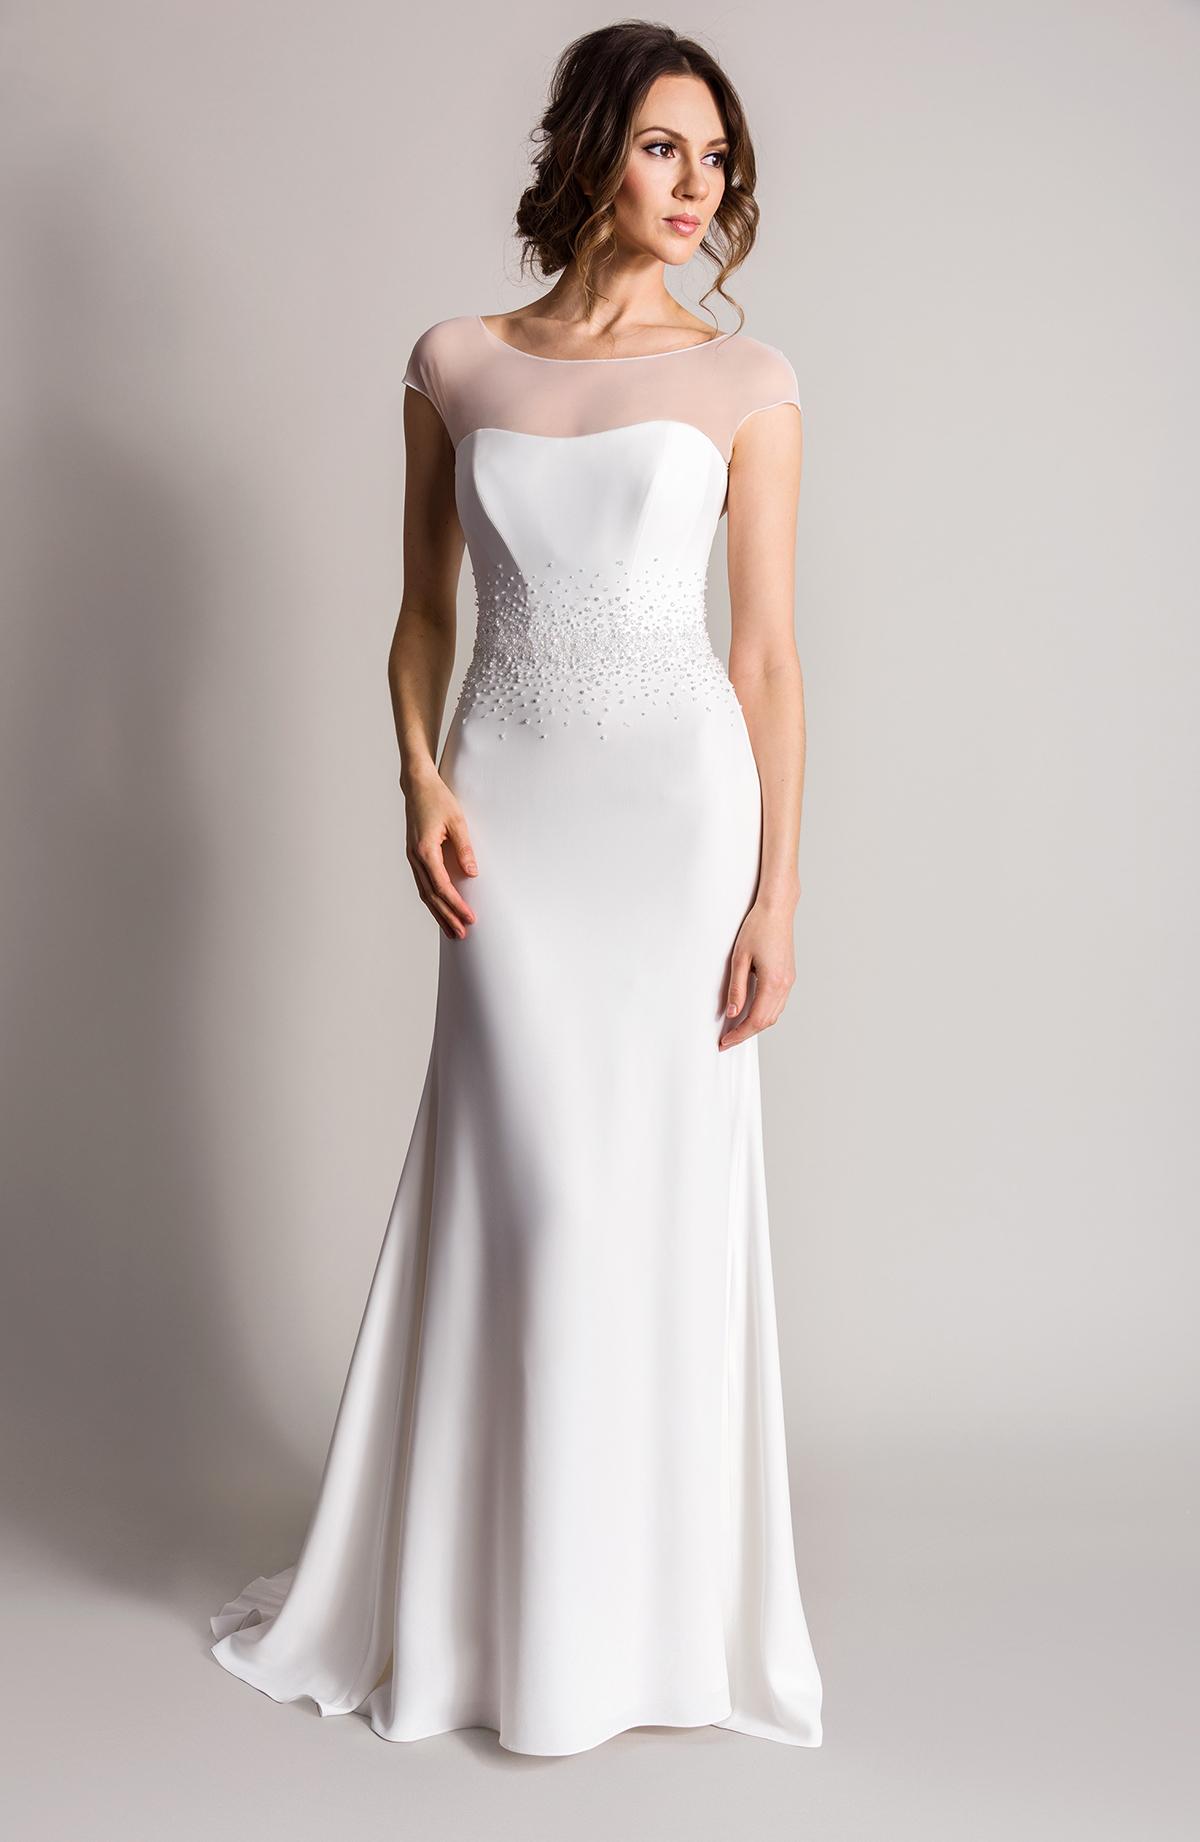 We unveil Suzanne Neville\'s latest designs - Love Our Wedding